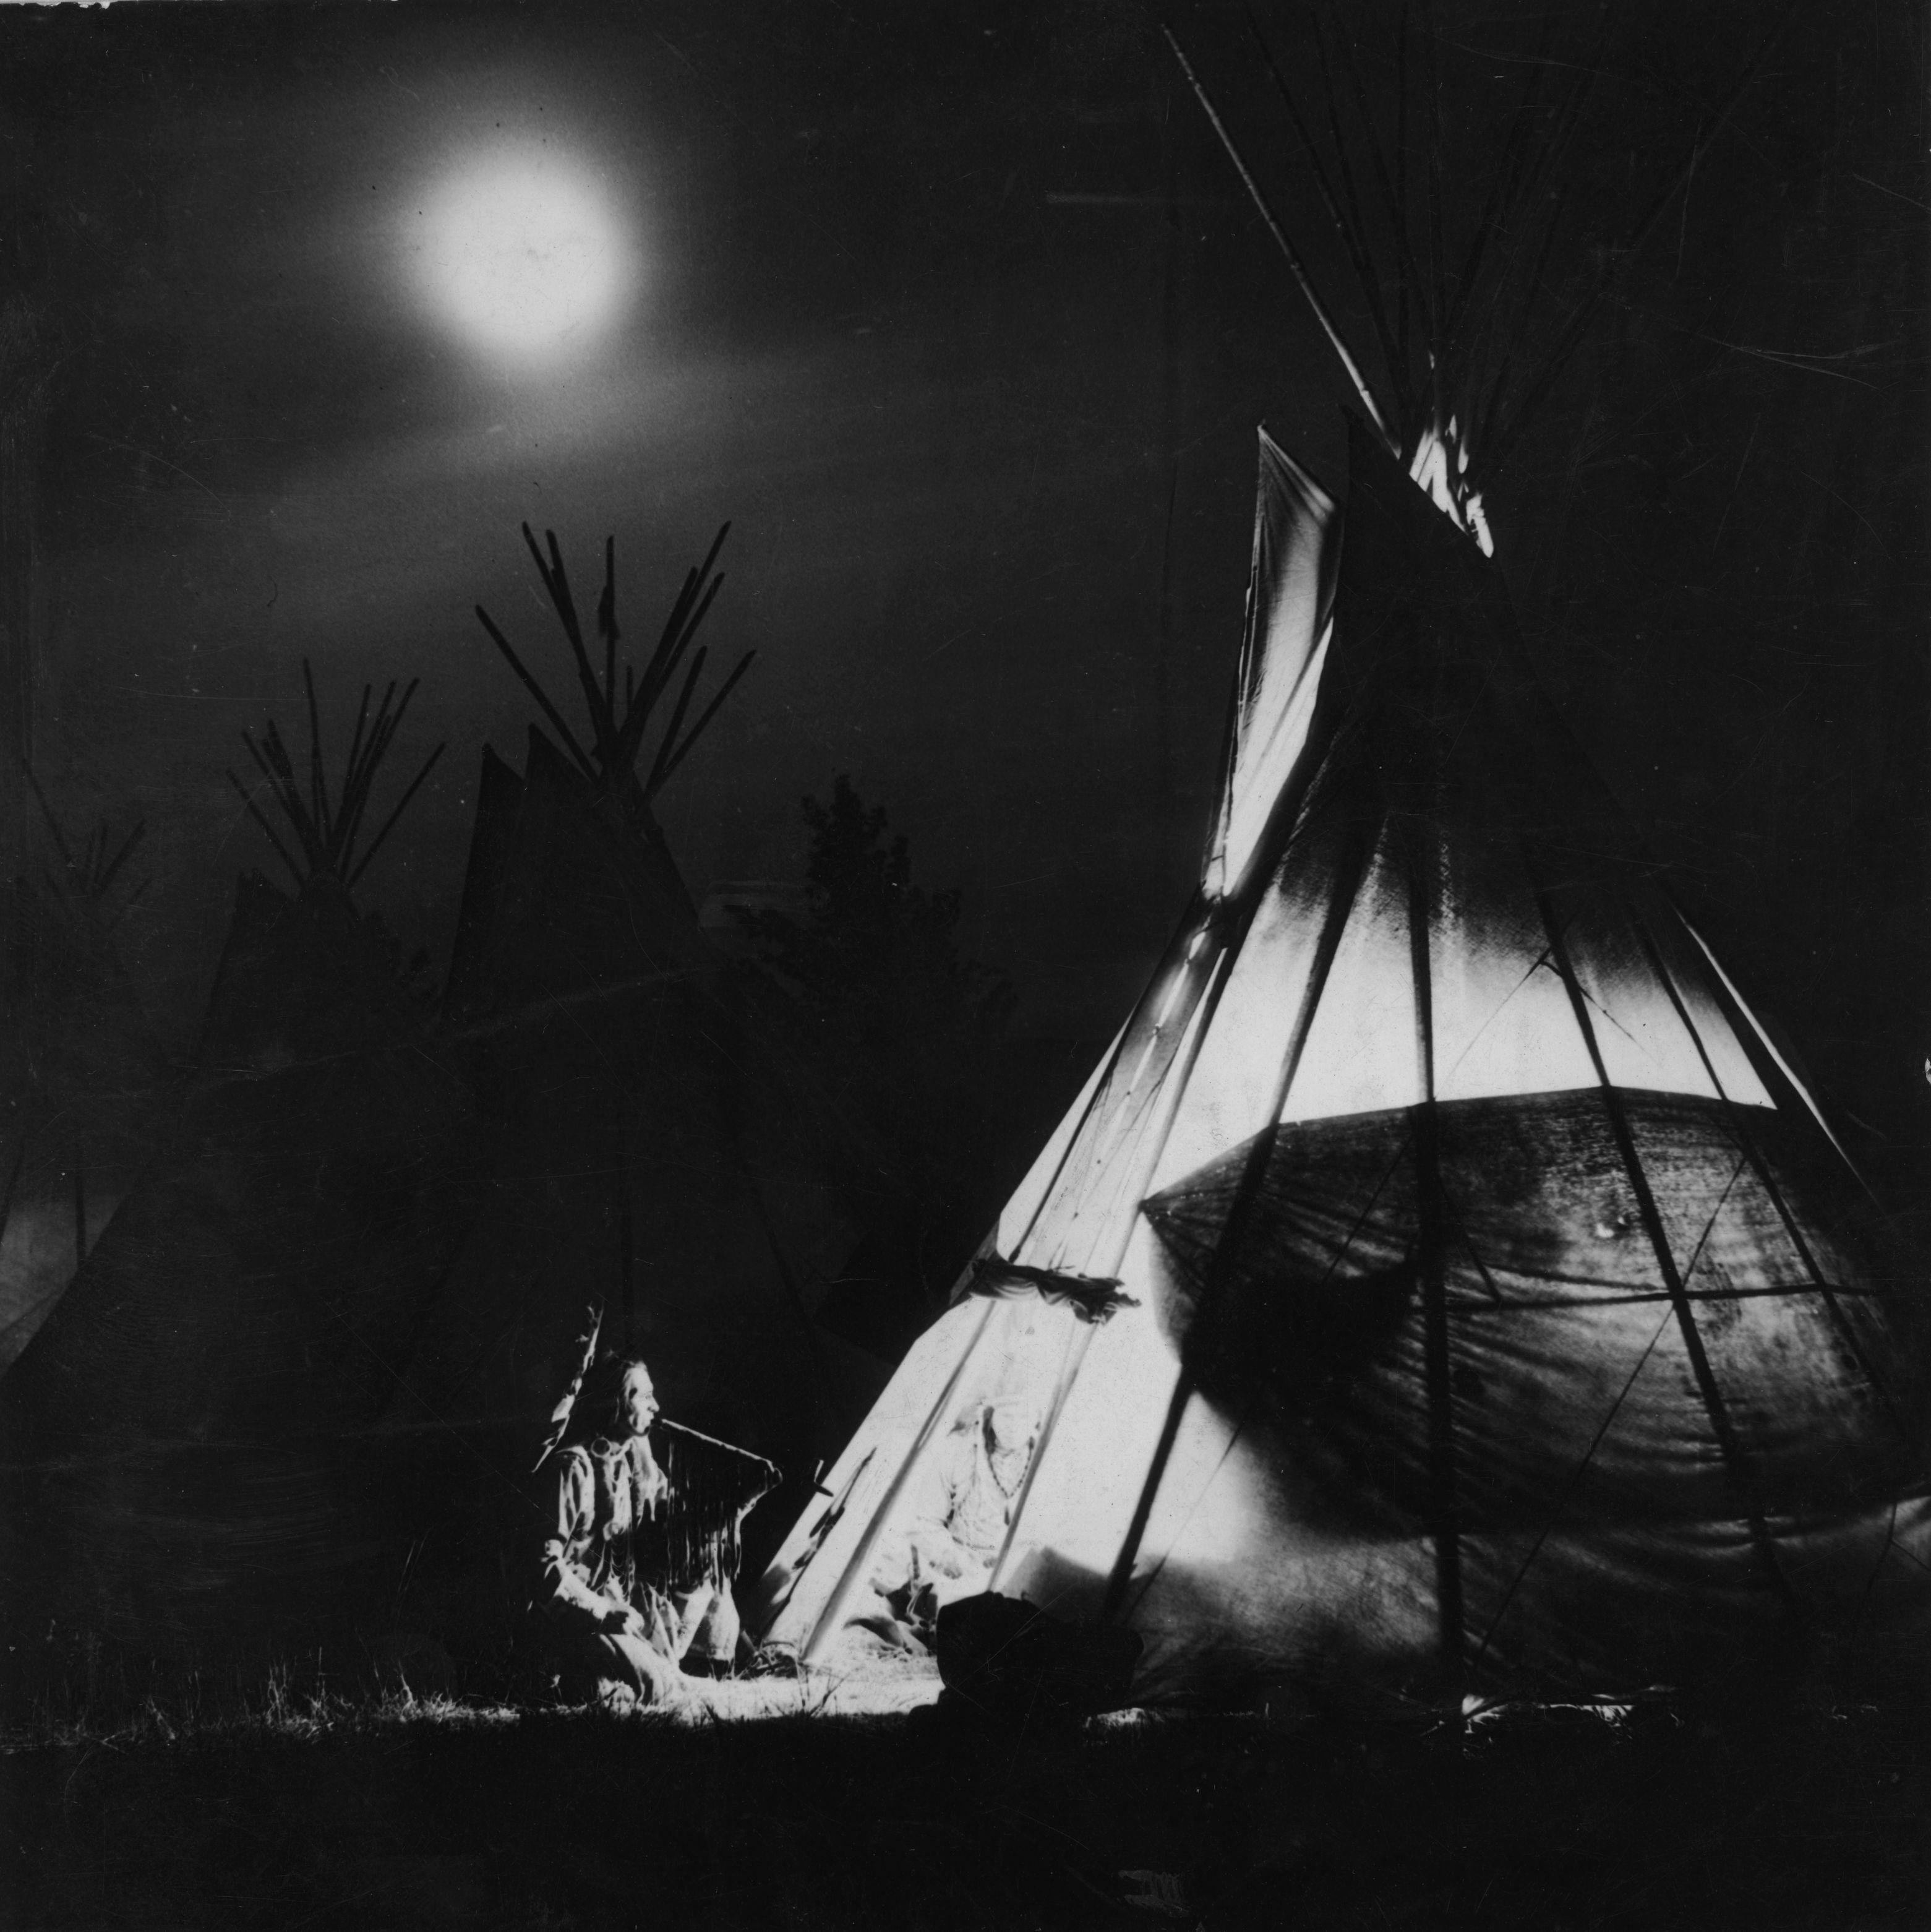 Blackfoot Smoking - The American Interest